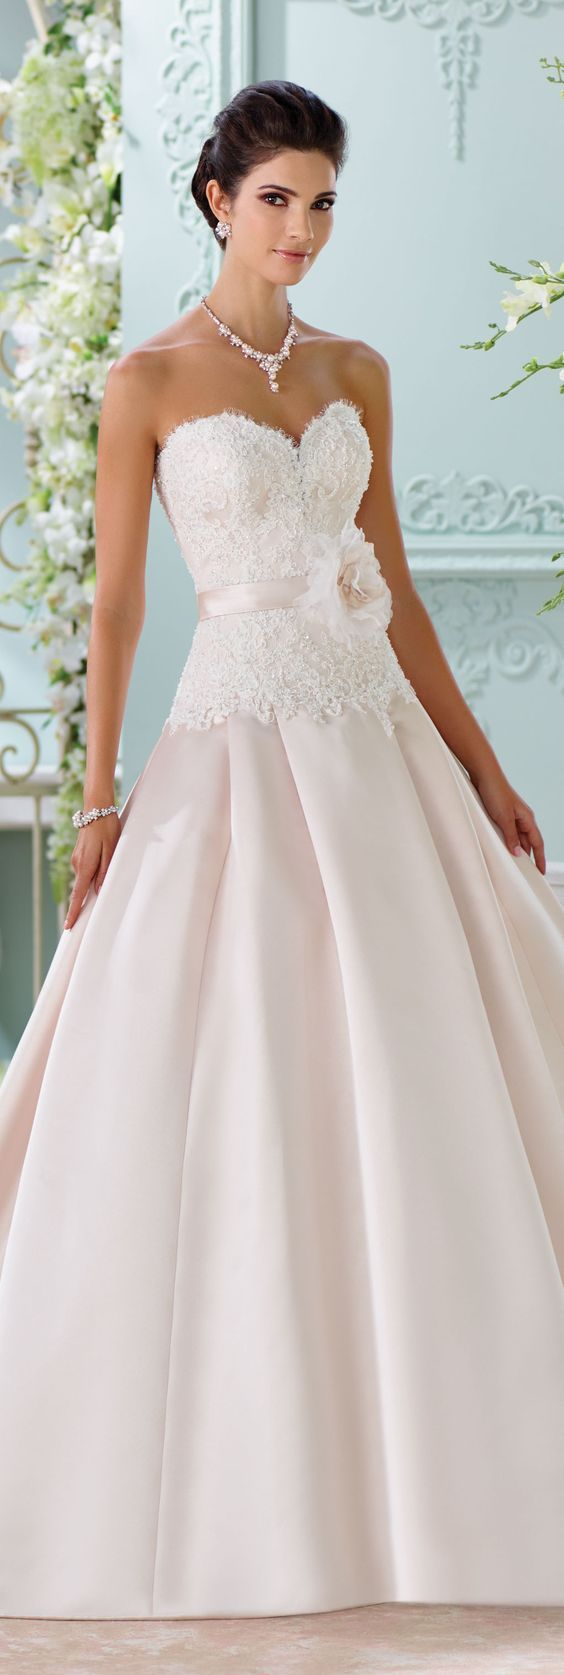 The David Tutera for Mon Cheri Spring 2016 Wedding Gown Collection - Style No. 116215 Lucienne #satinandlaceweddingdress